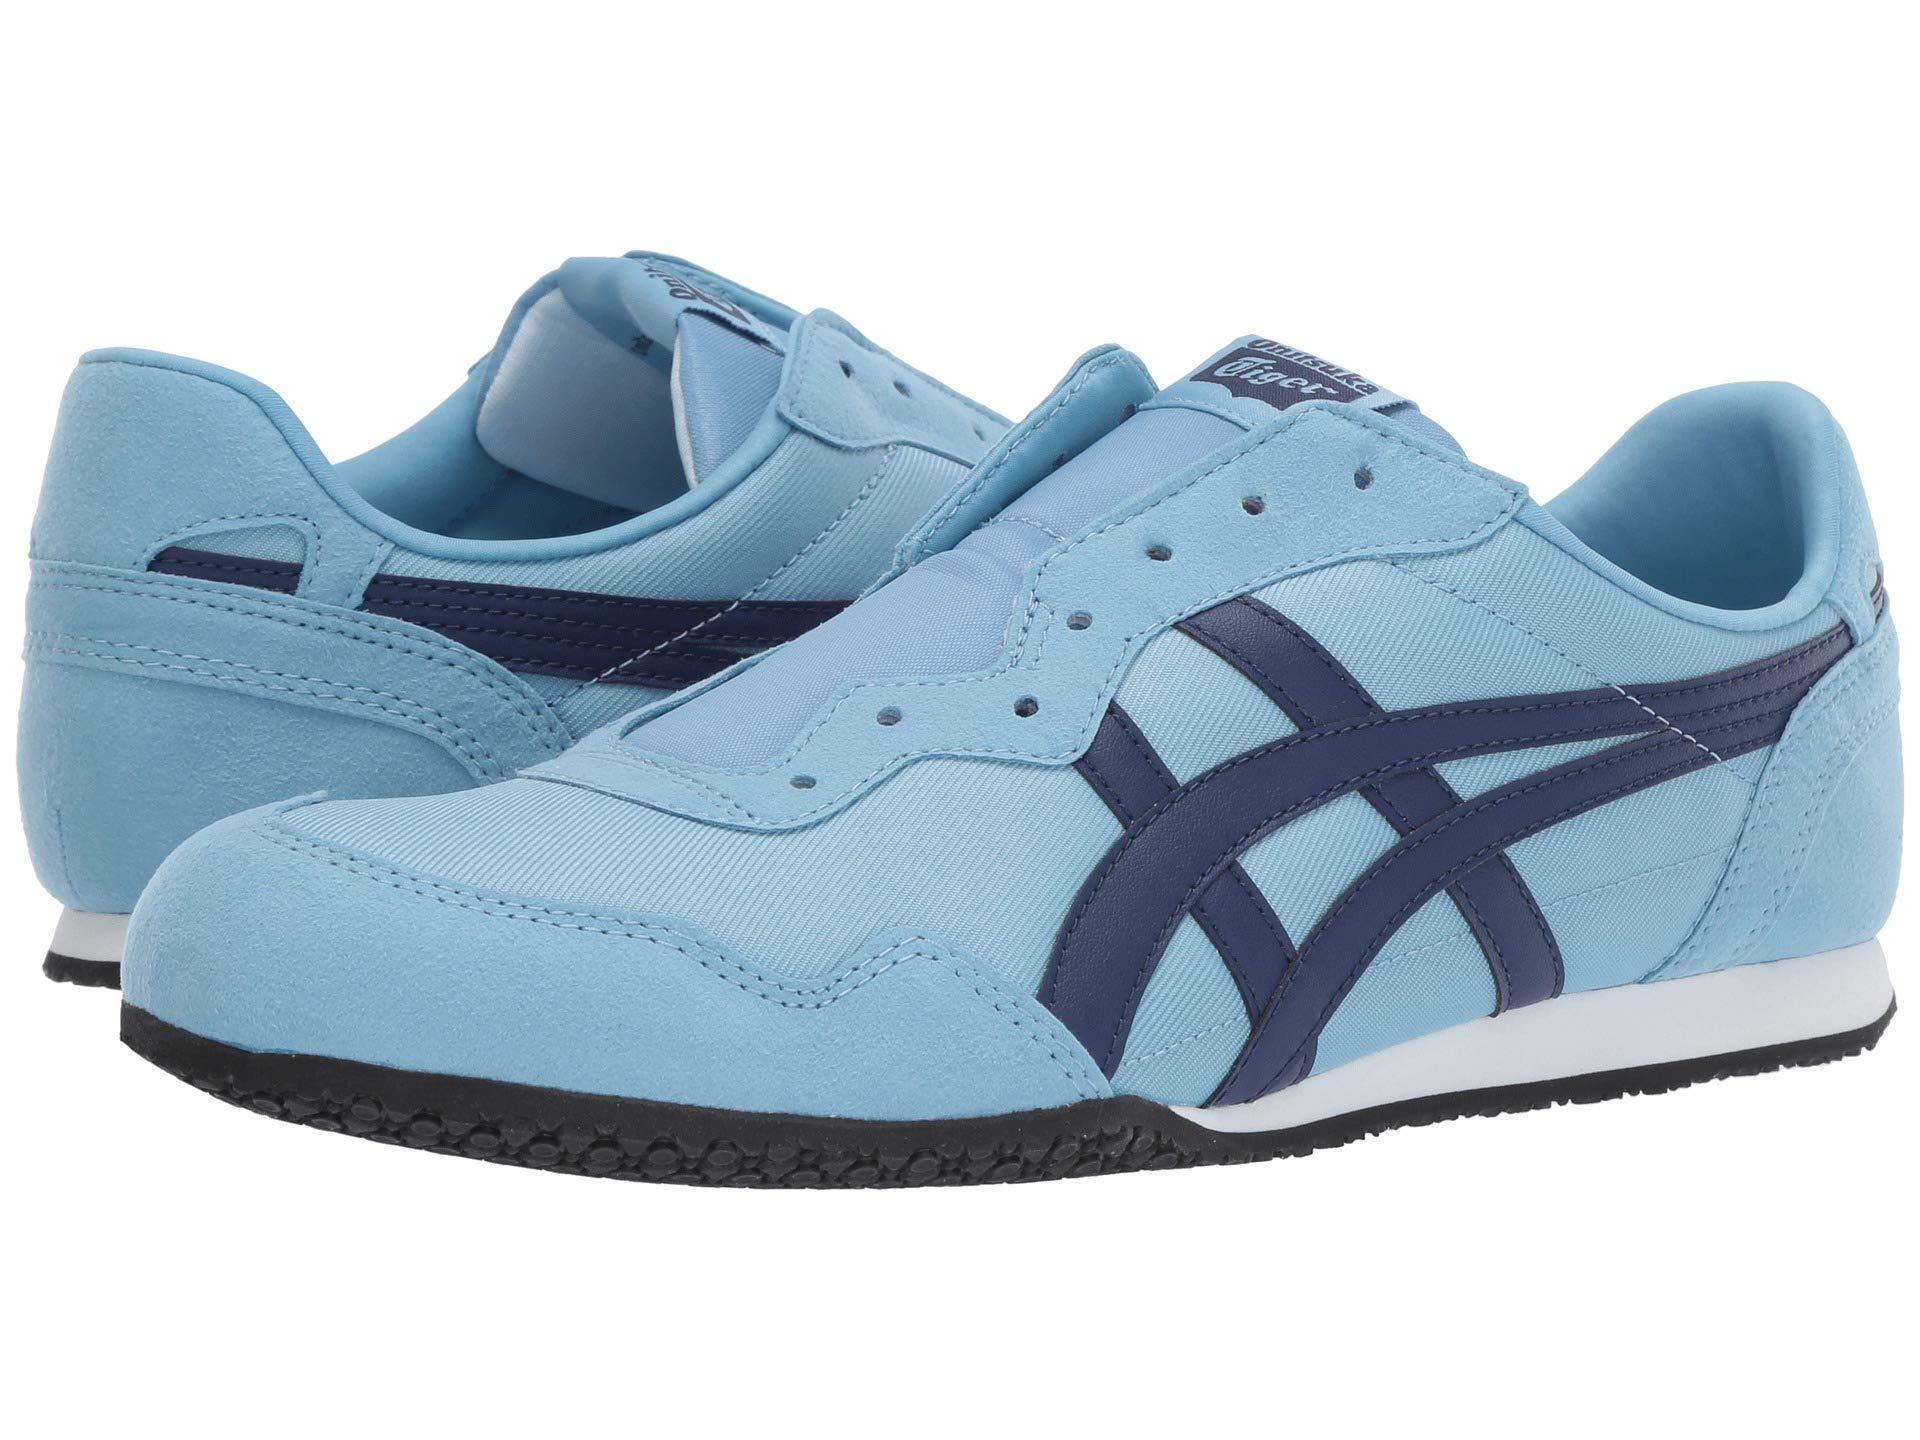 e9ec330bac1 Men's Blue Serrano Slip-on (white/black) Classic Shoes